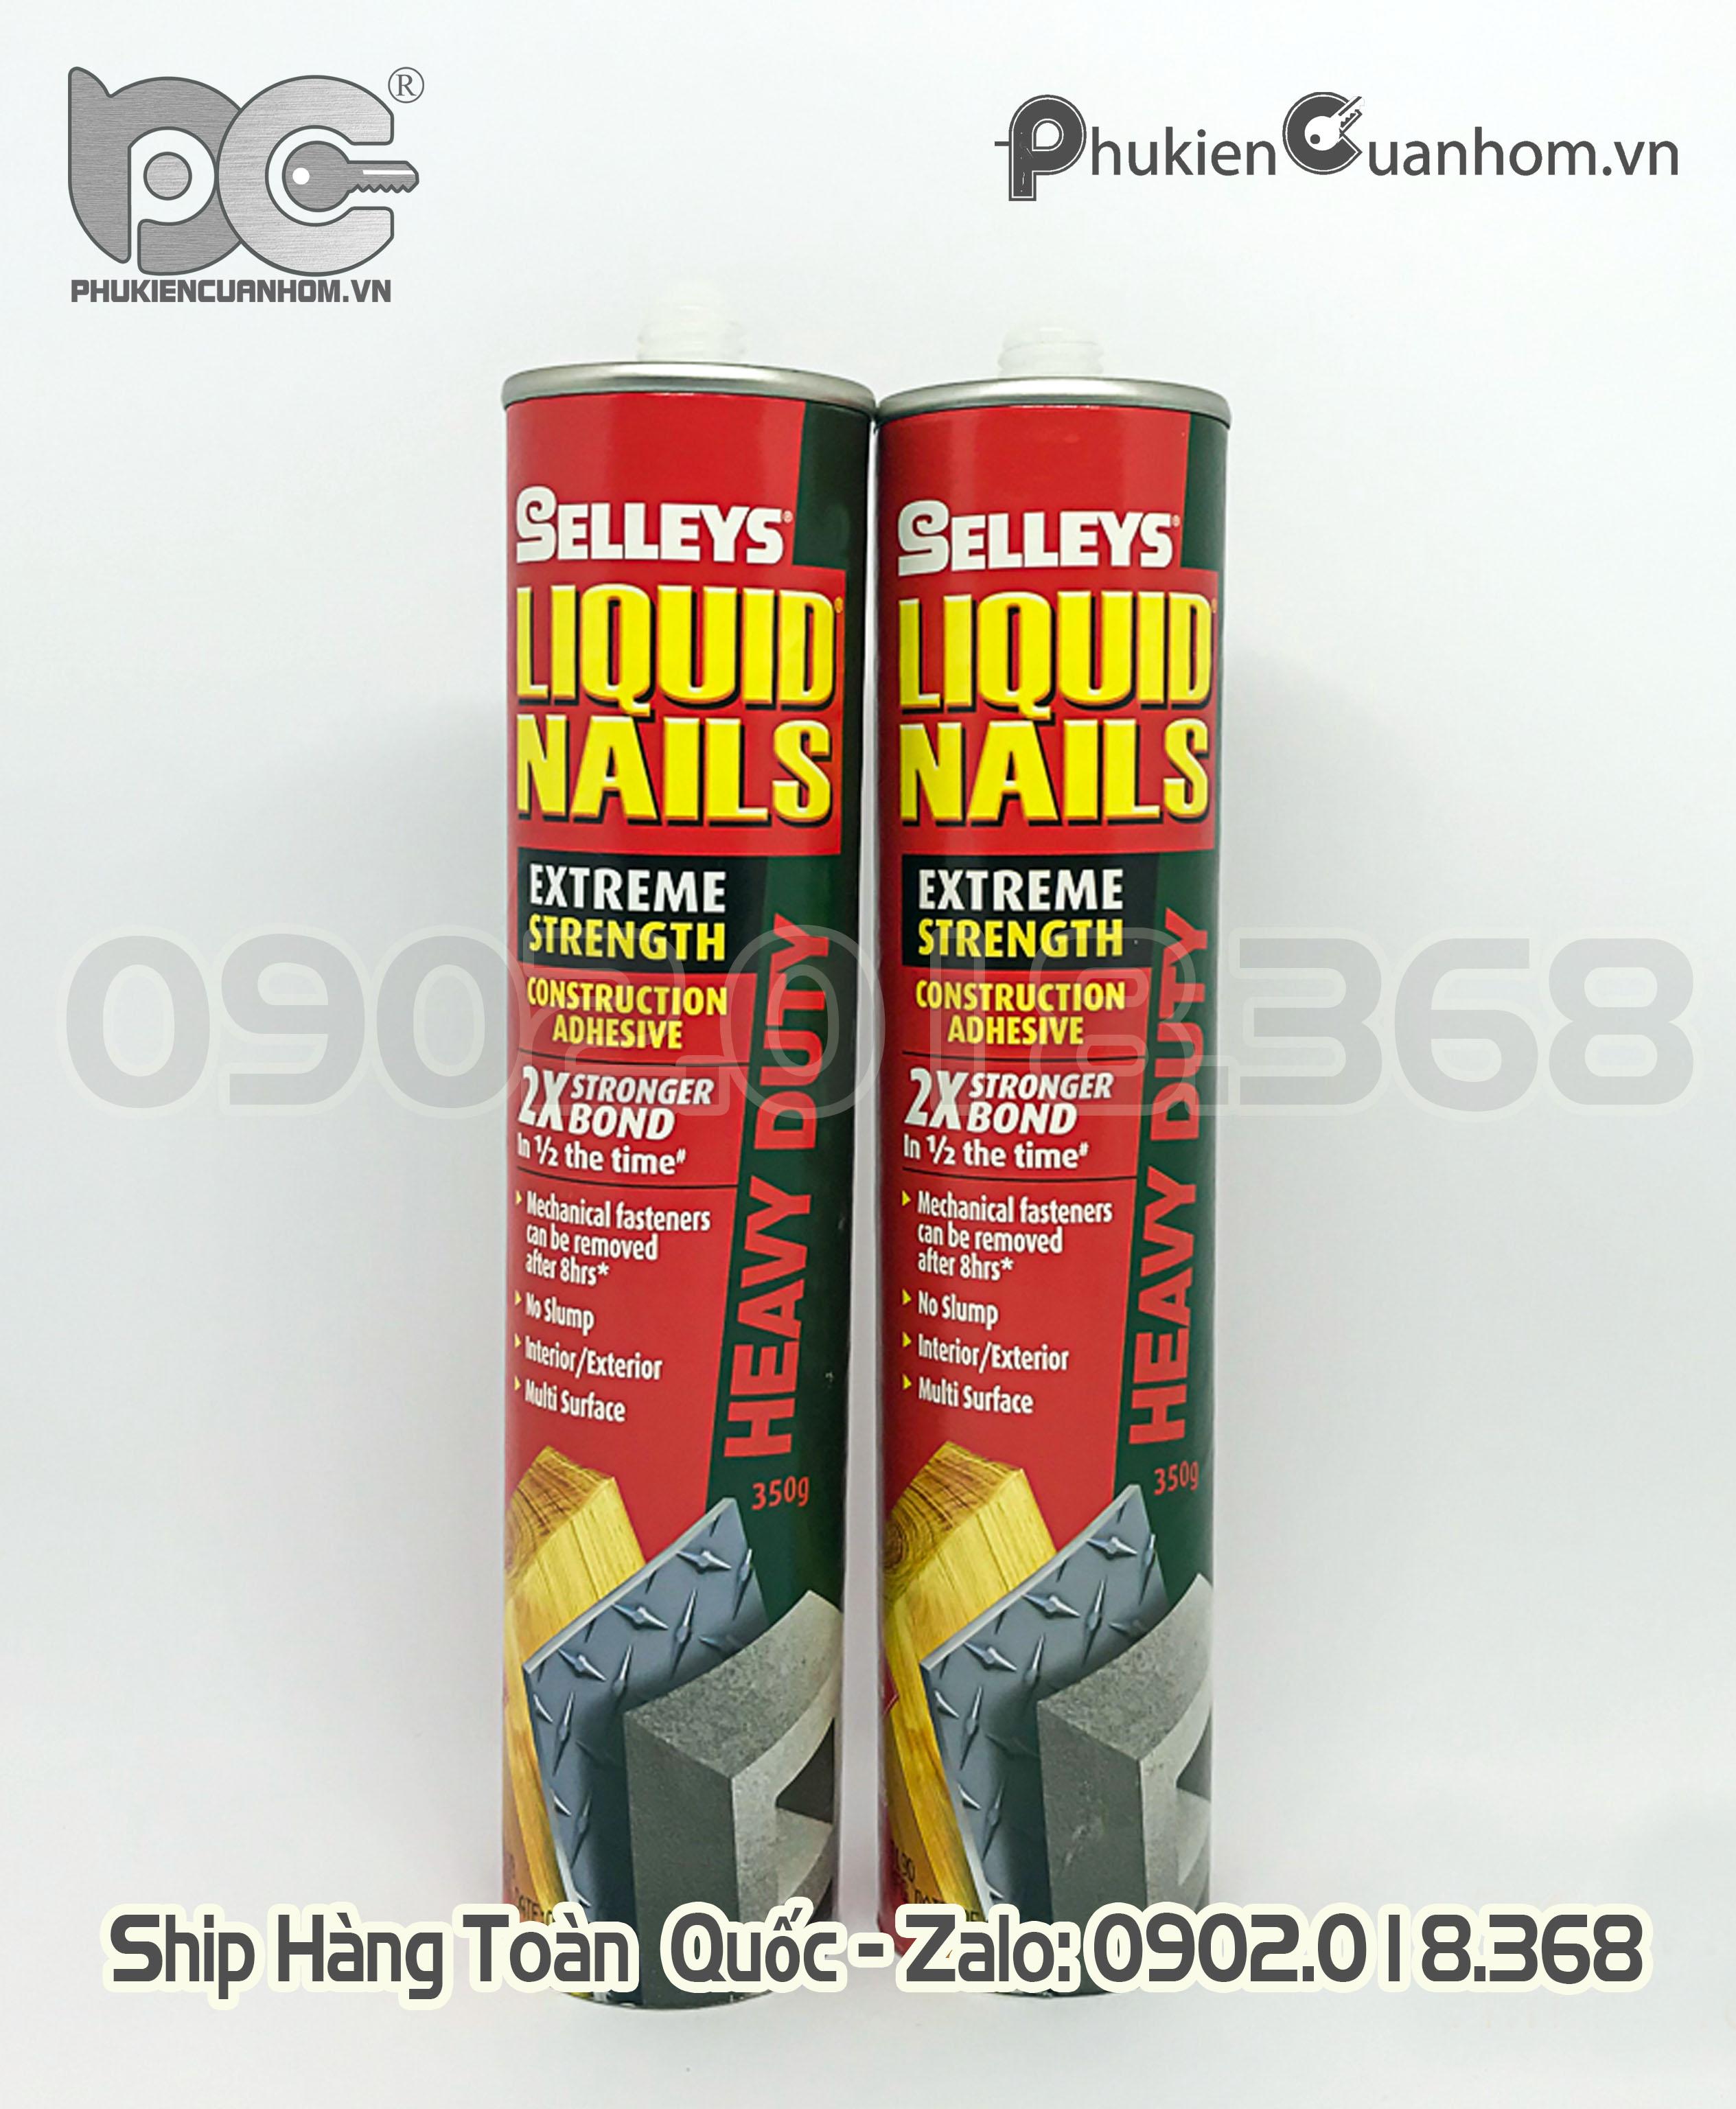 Keo xây dựng độ bền cực cao Selleys Liquid Nails Heavy Duty